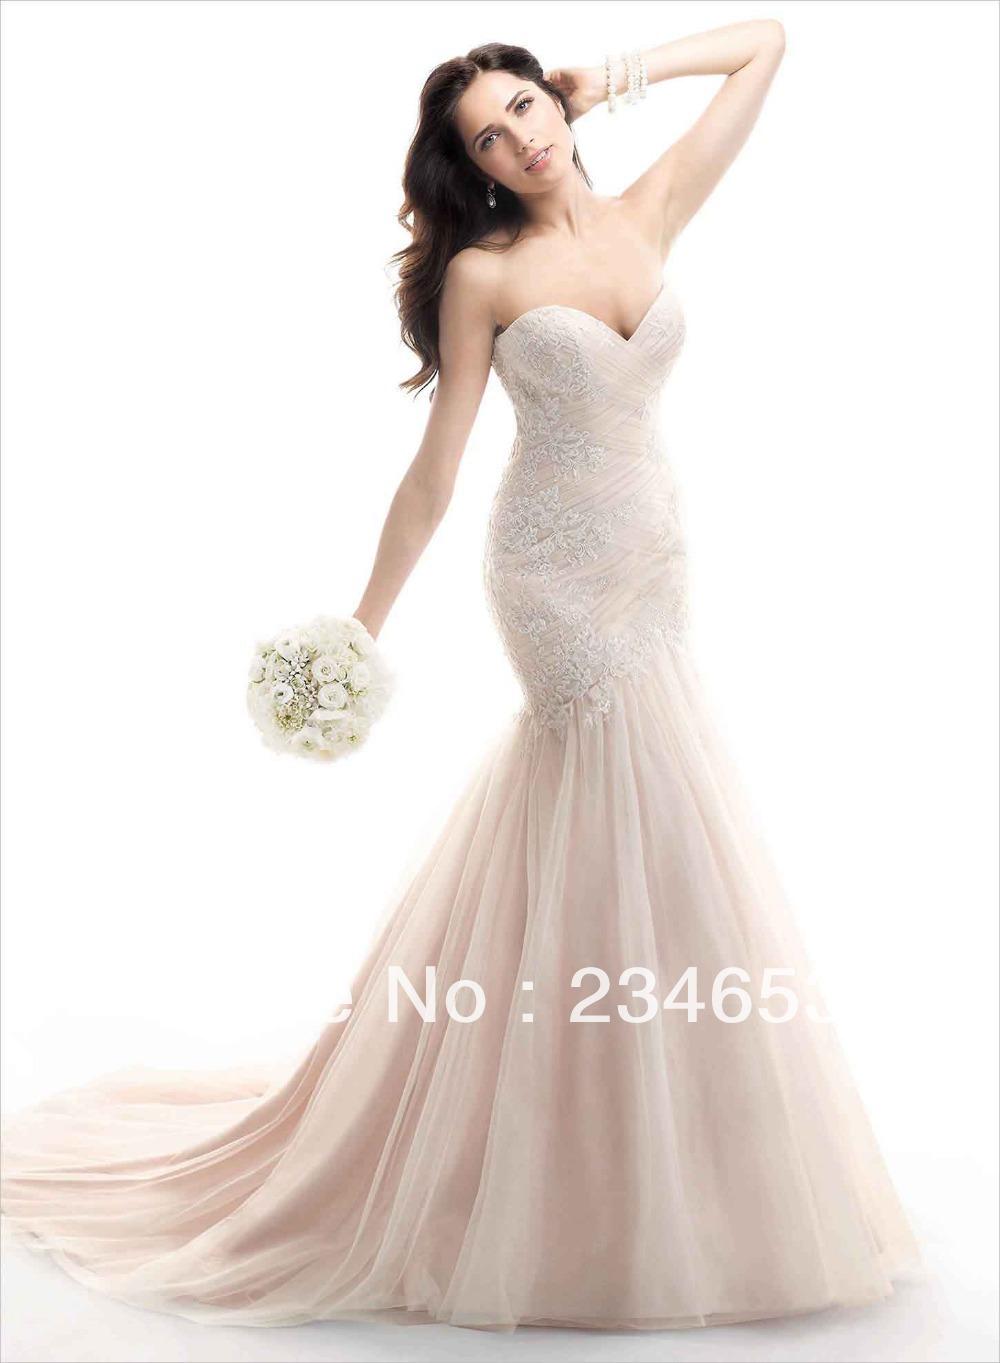 blush colored wedding dresses Pink wedding dresses